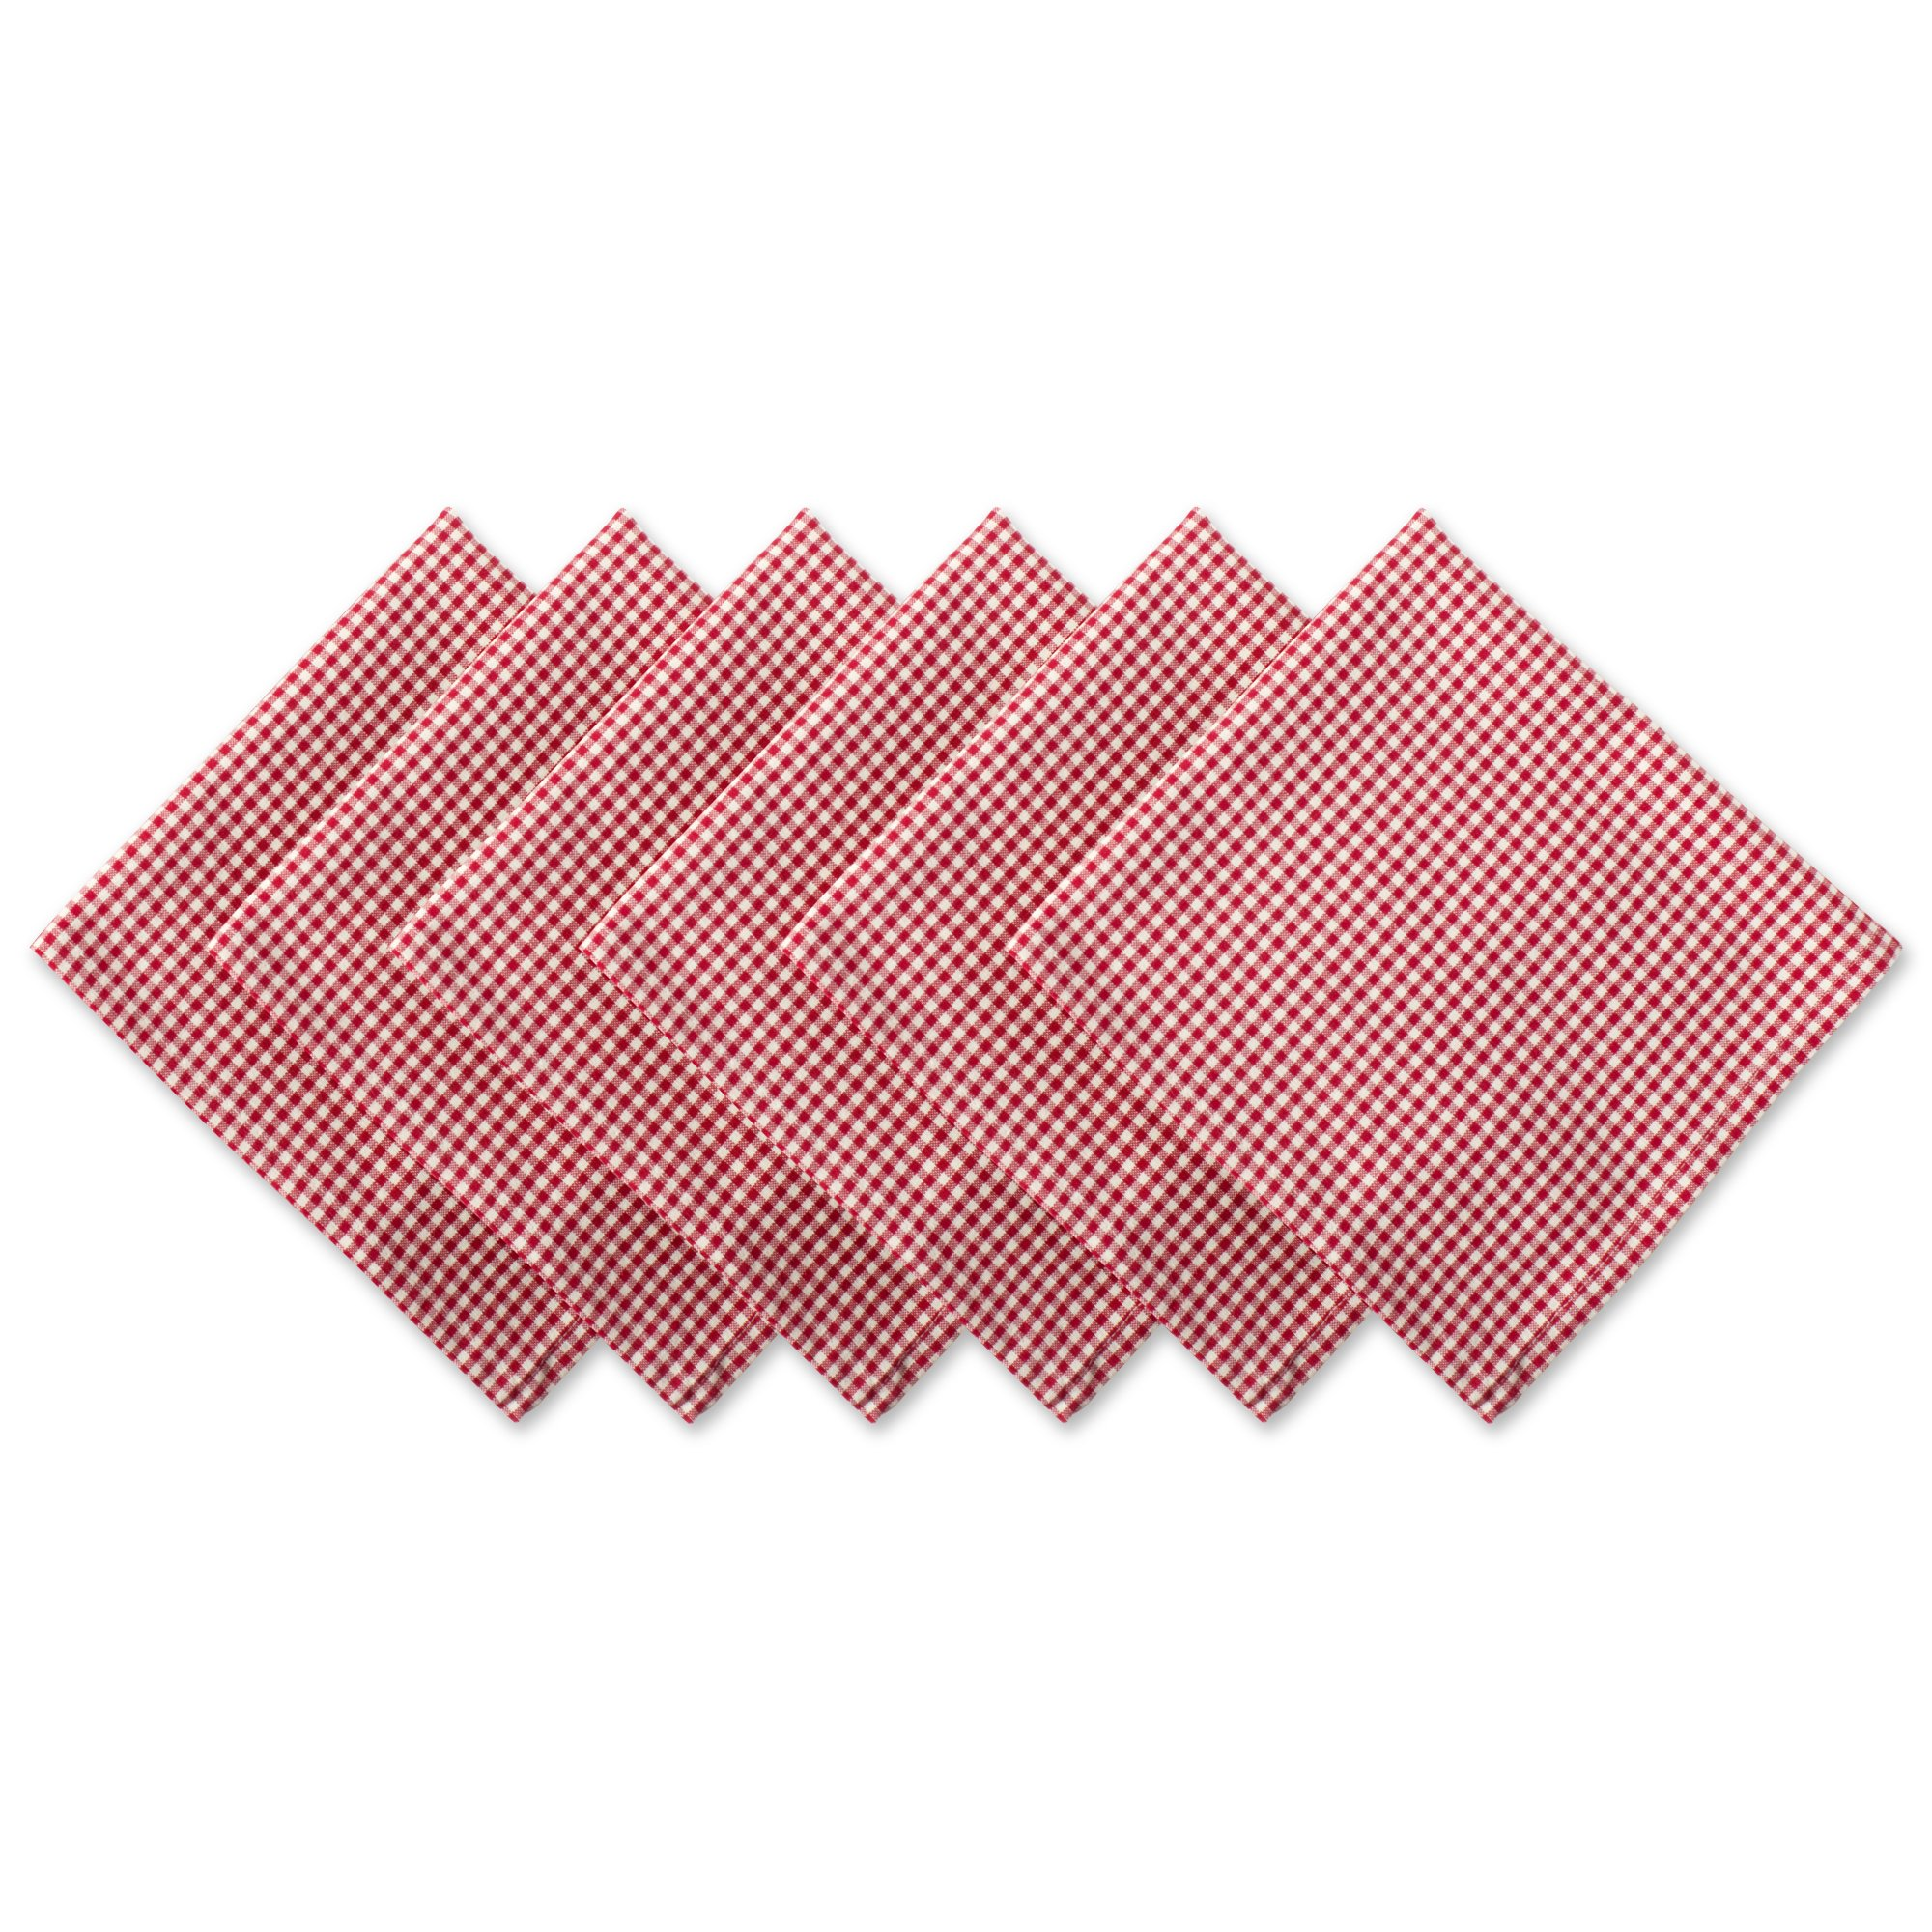 DII Oversized Basic Everyday Napkin (Set of 6), 20 x 20, Red Cider